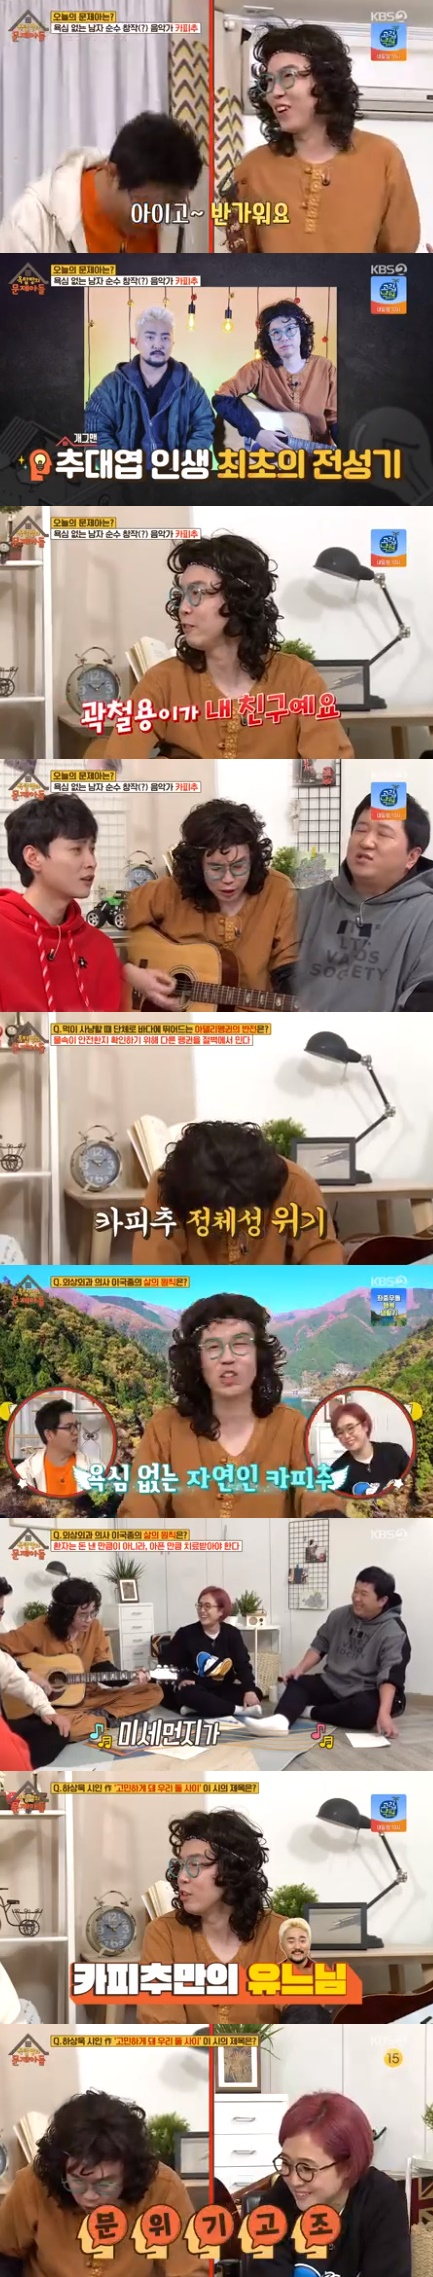 KBS 2TV '옥탑방의 문제아들'